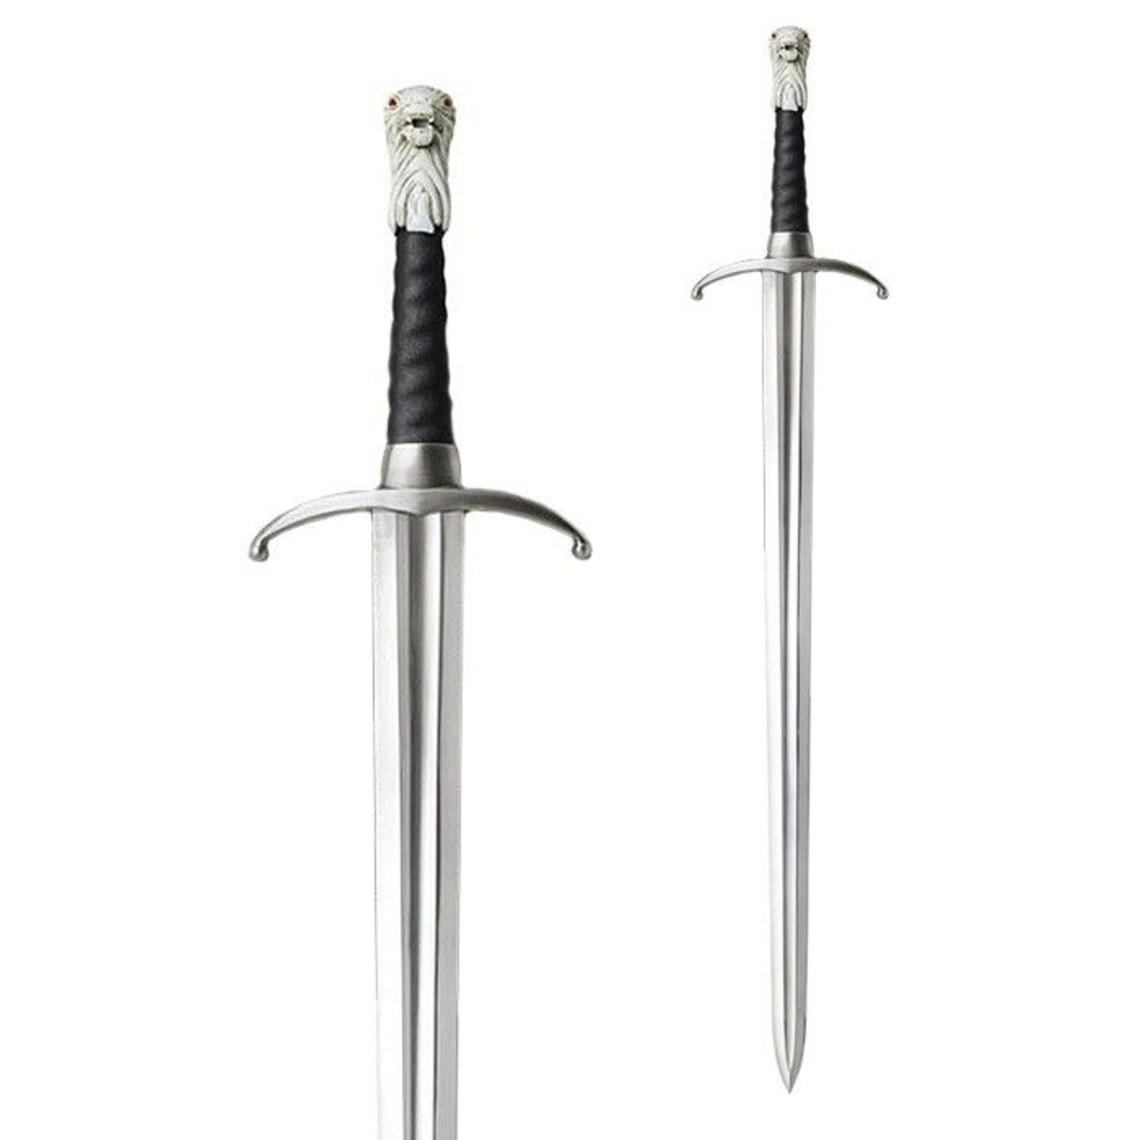 United Cutlery Game Of Thrones - Longclaw zwaard van Jon Snow